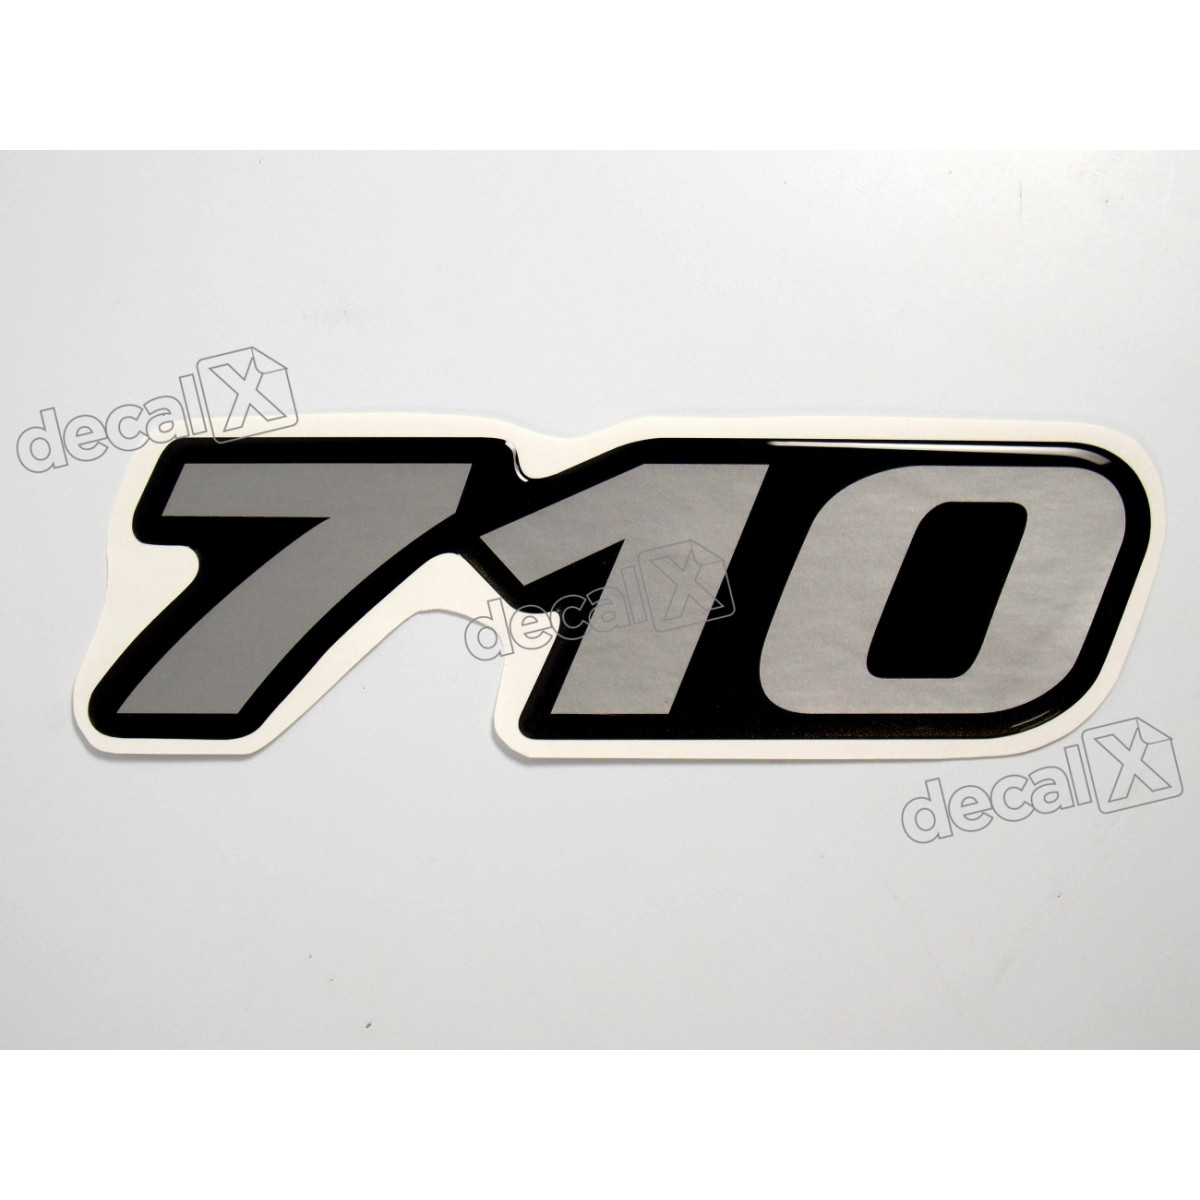 Adesivo Emblema Resinado Mercedes 710 Cm7 Decalx